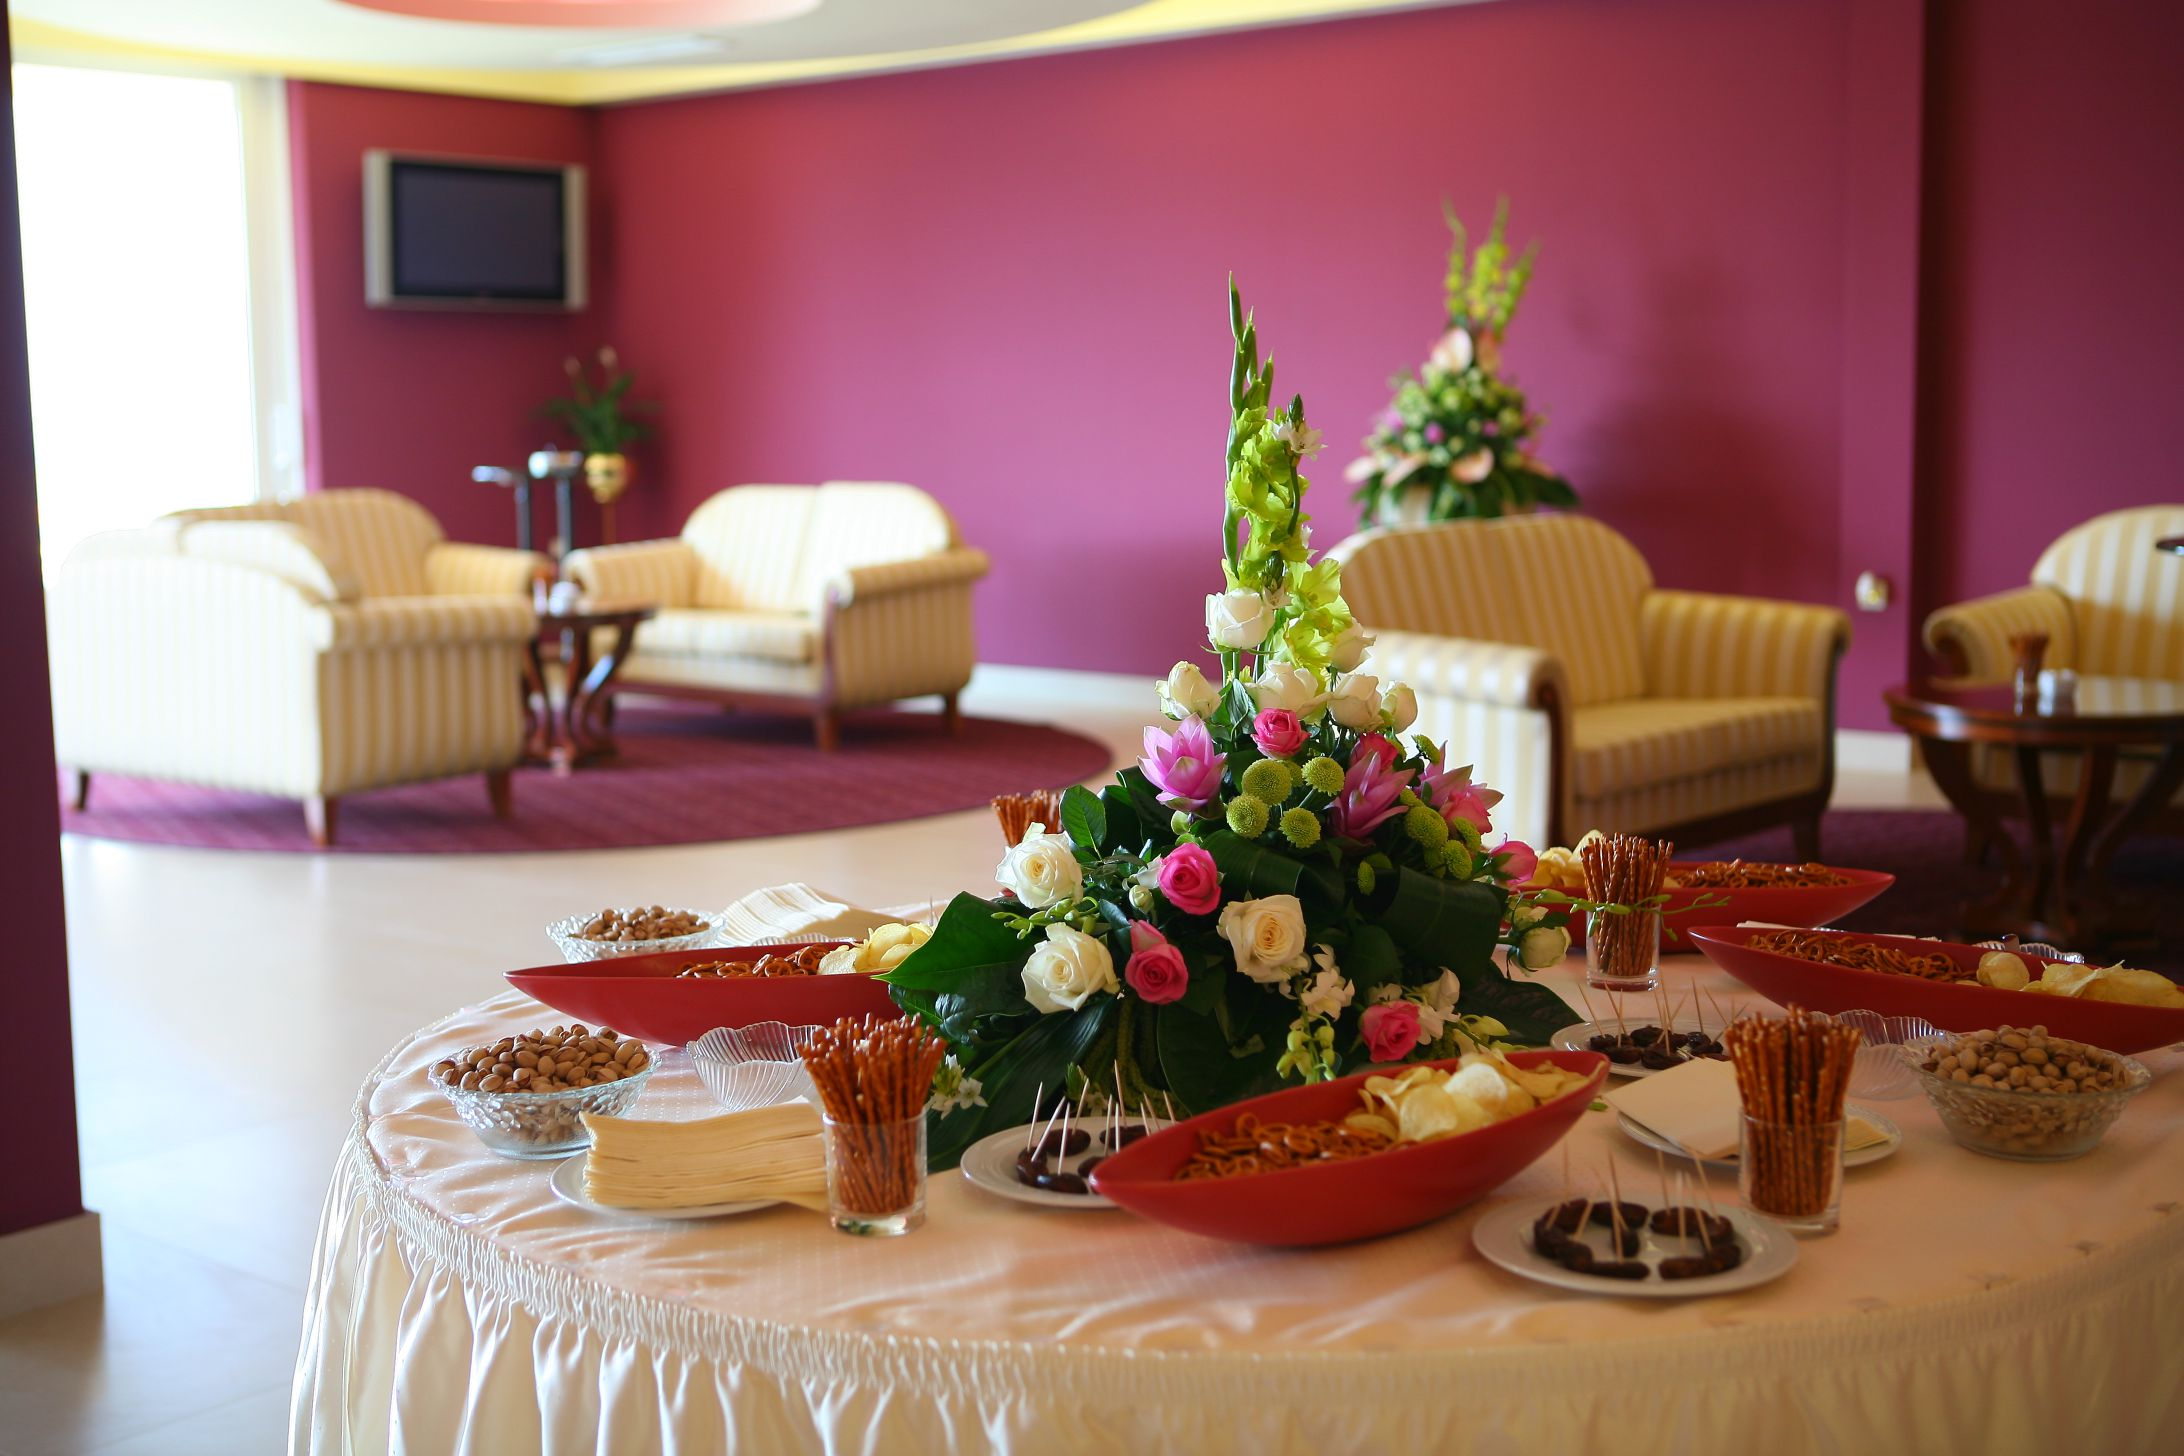 congress center lobby bar 07 14639410340 o - Zora Hotel